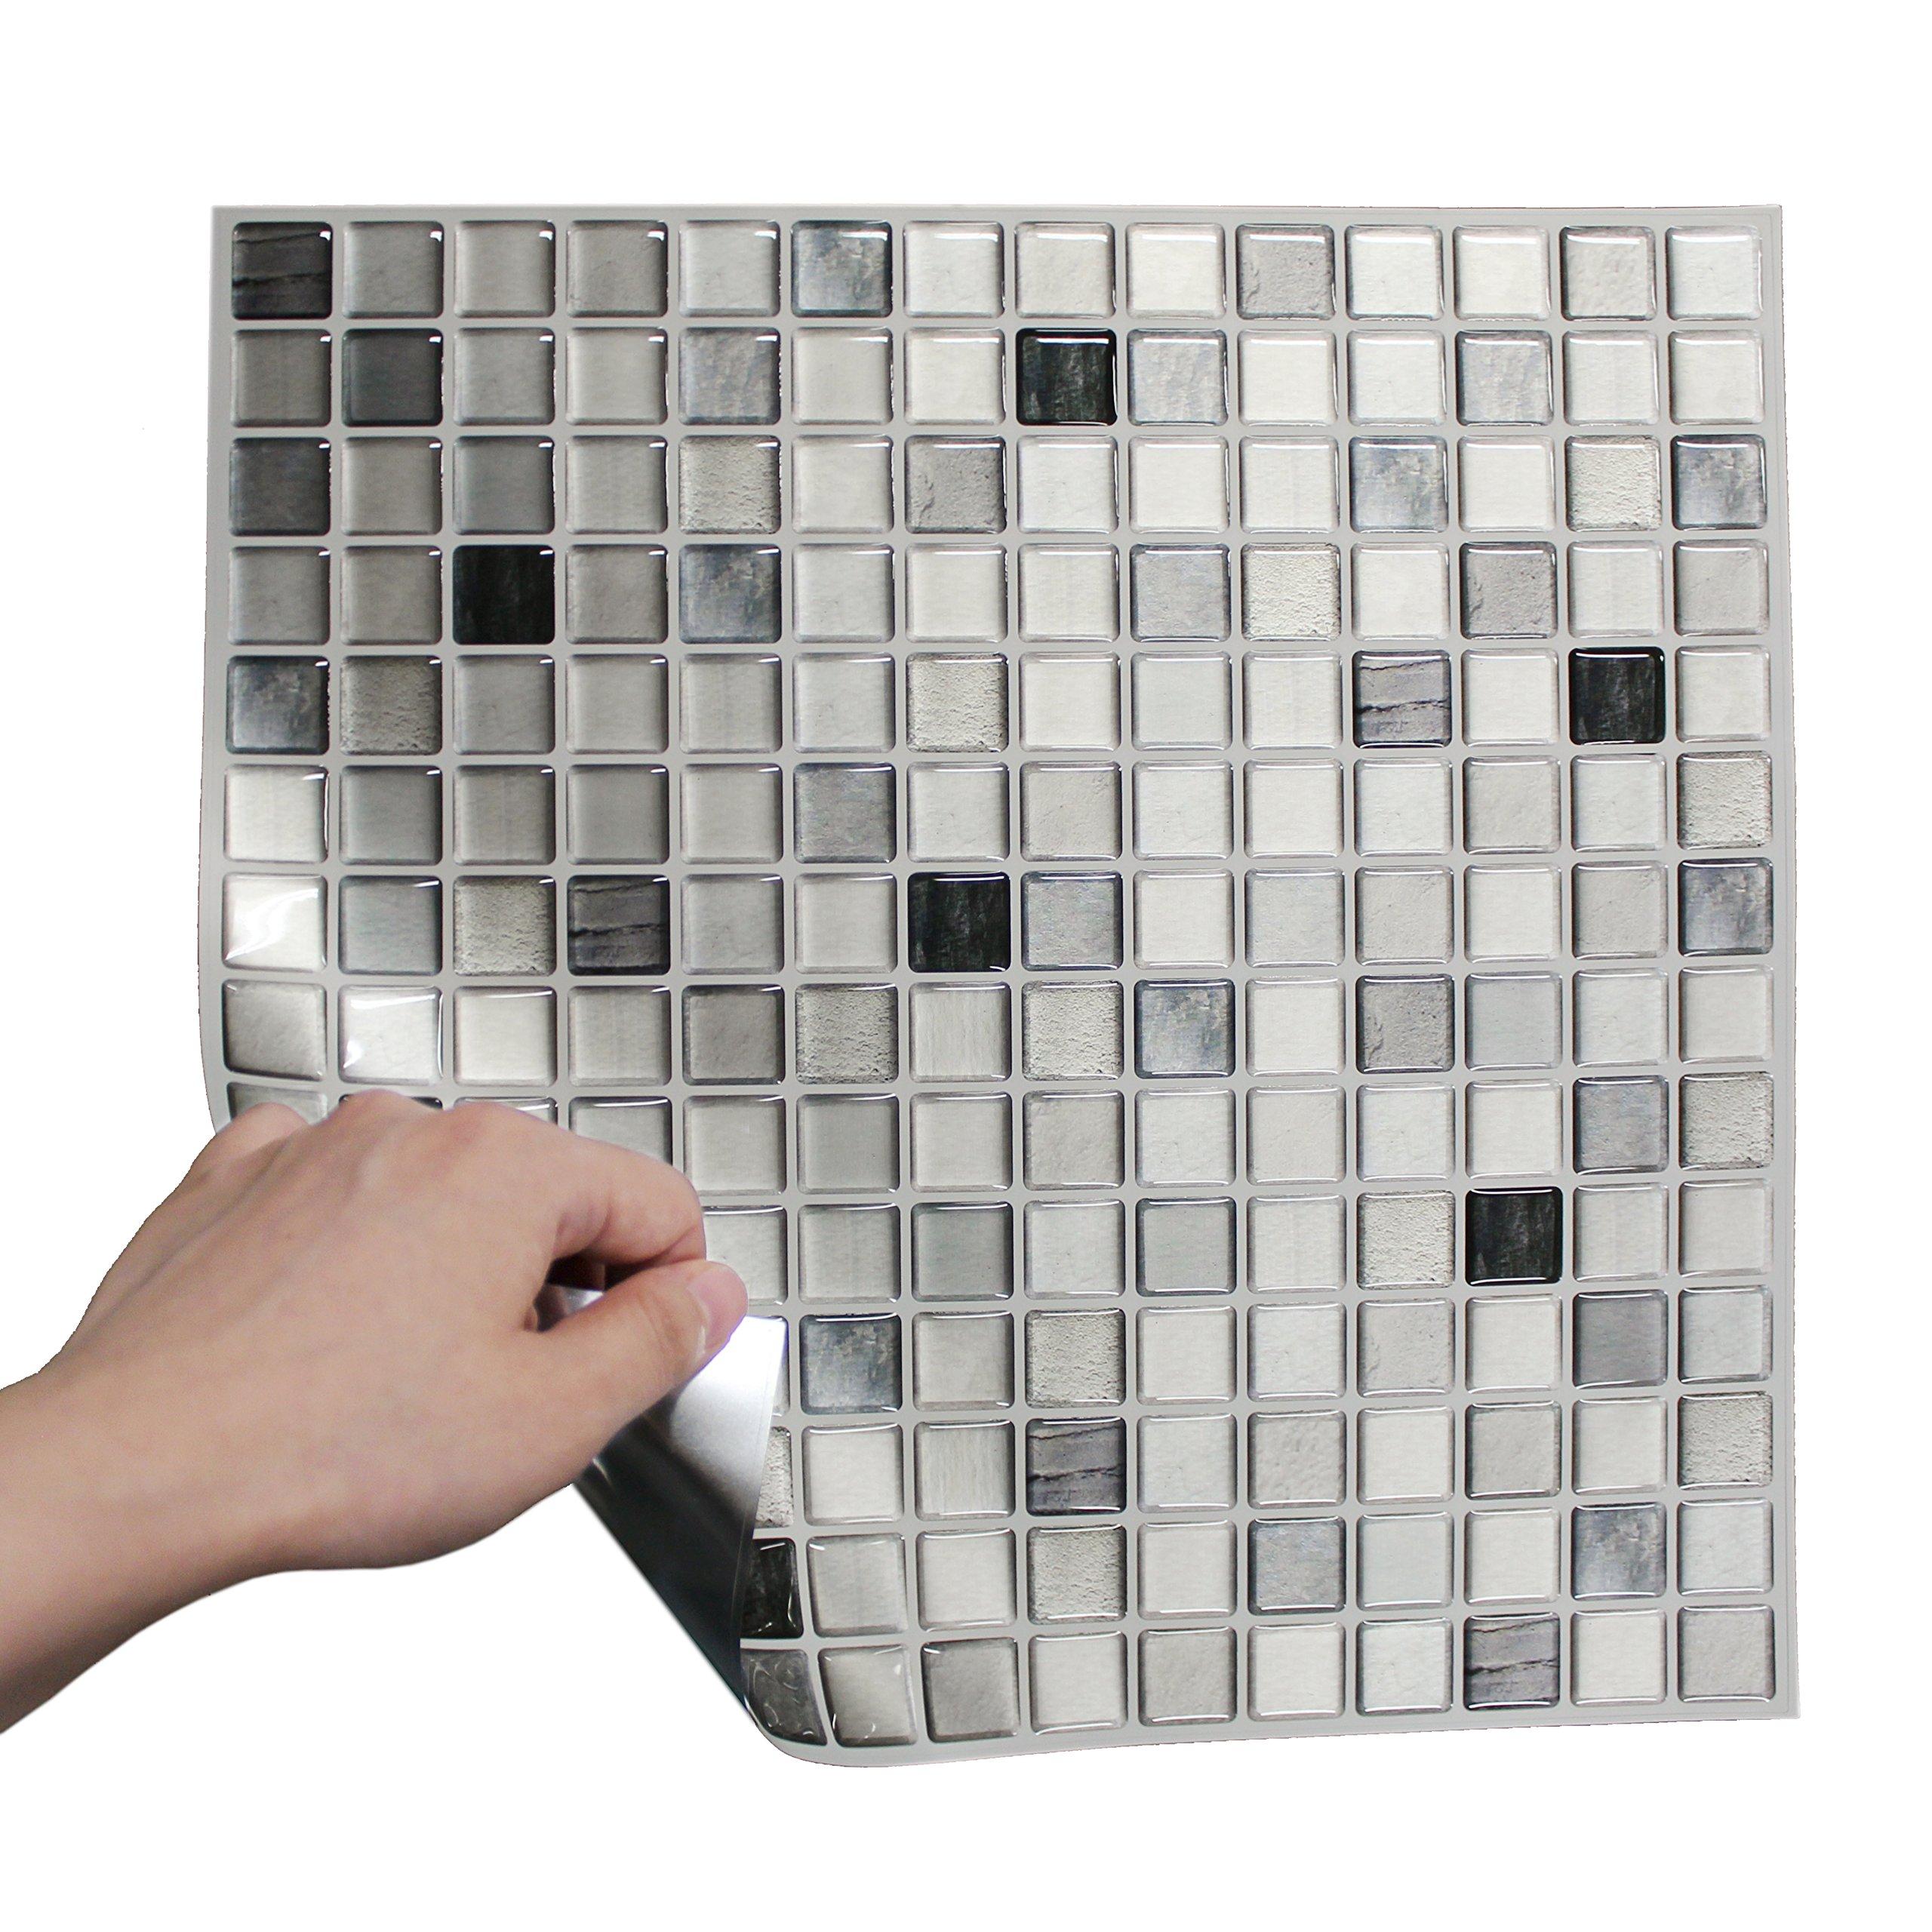 BEAUSTILE Decorative Tile Stickers Peel Stick Backsplash Fire Retardant Tile Sheet (Monocrome) (10, 12.2'' x 12.2'') by BEAUS TILE (Image #5)